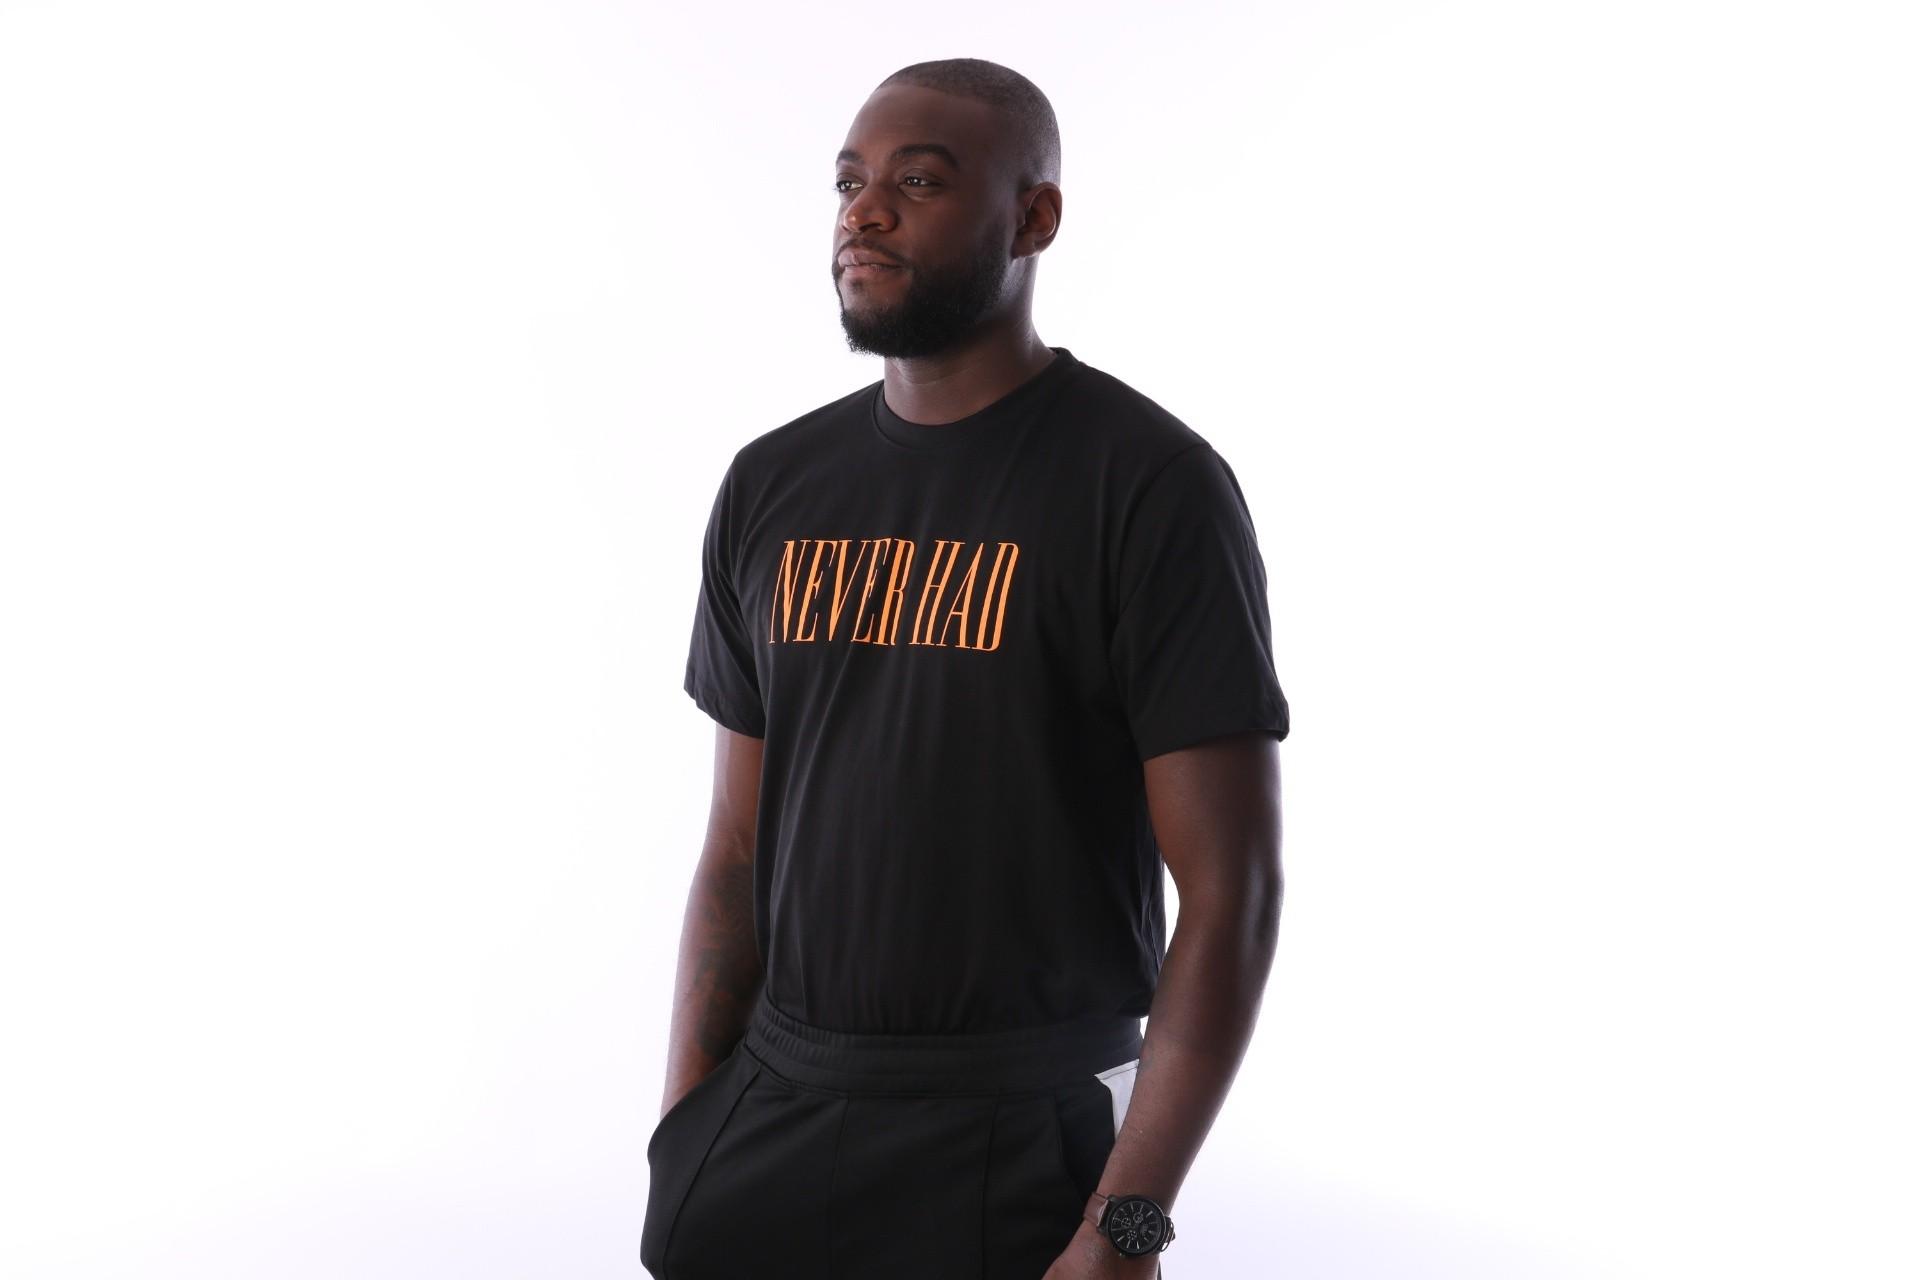 Foto van Aristoteles Never Had T-shirt NHT02 Black / Orange